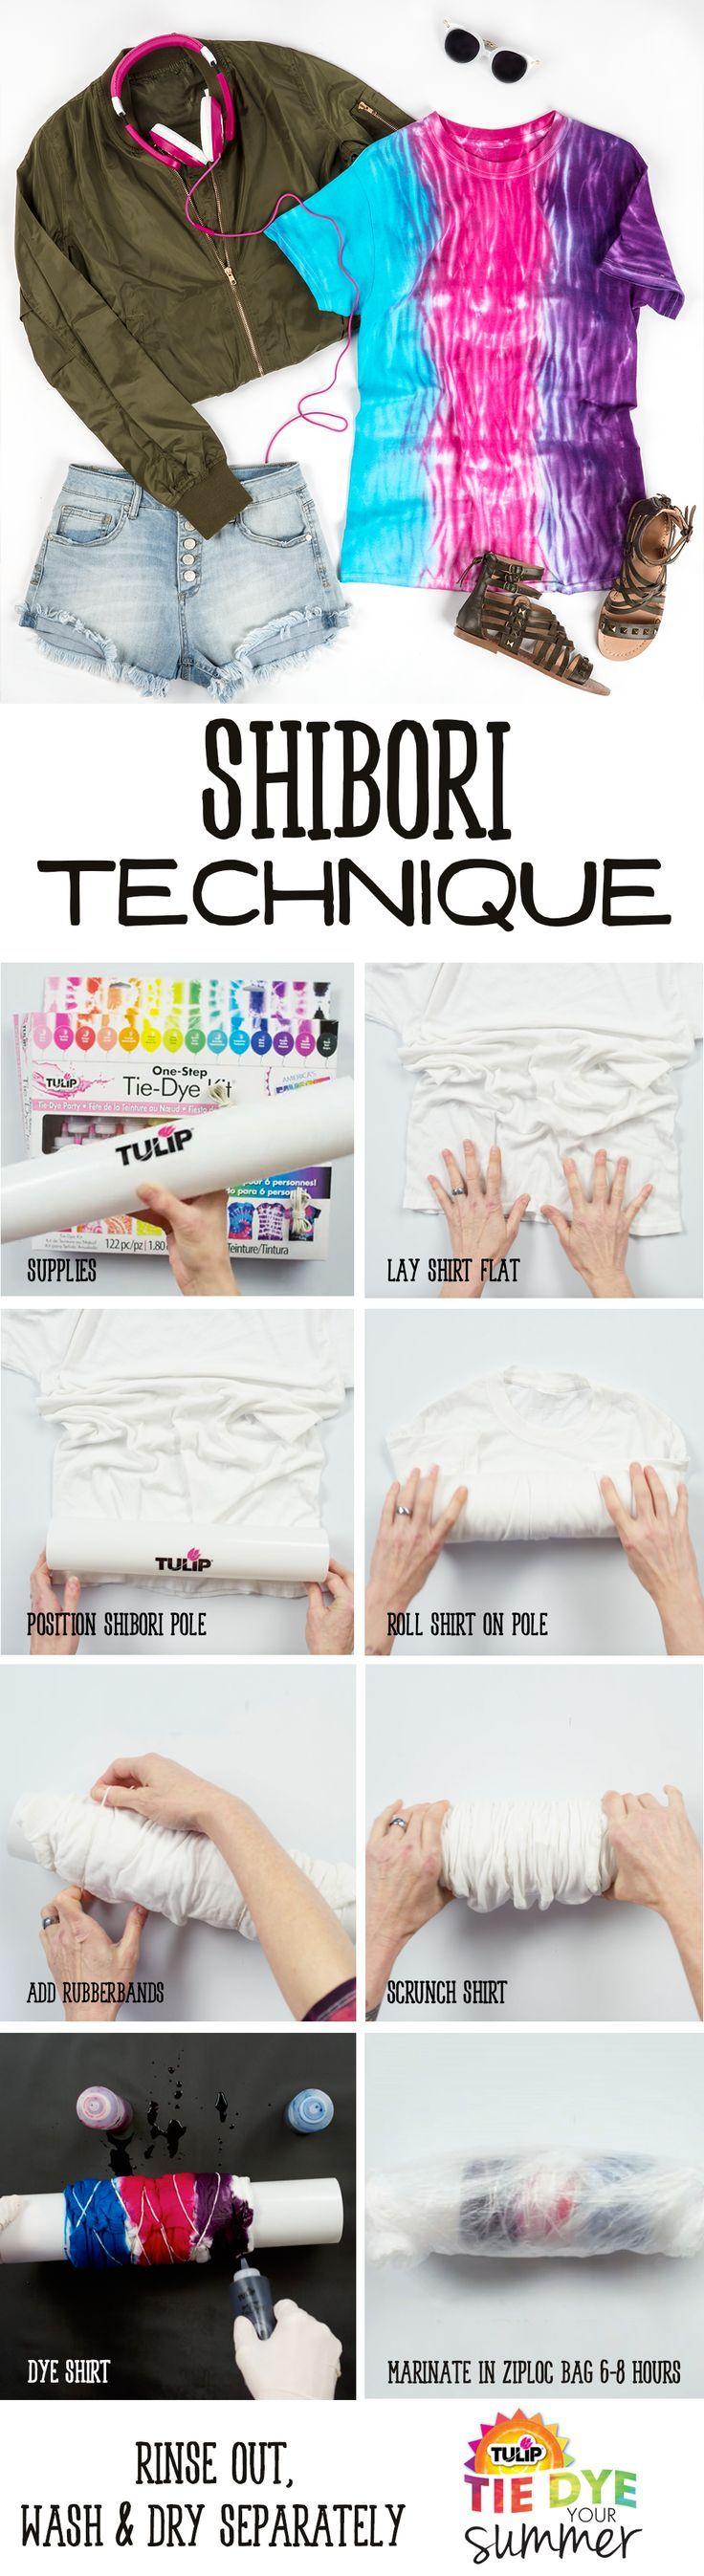 207 best 101 tie dye shirt ideas images on pinterest craft summer activities and summer crafts. Black Bedroom Furniture Sets. Home Design Ideas